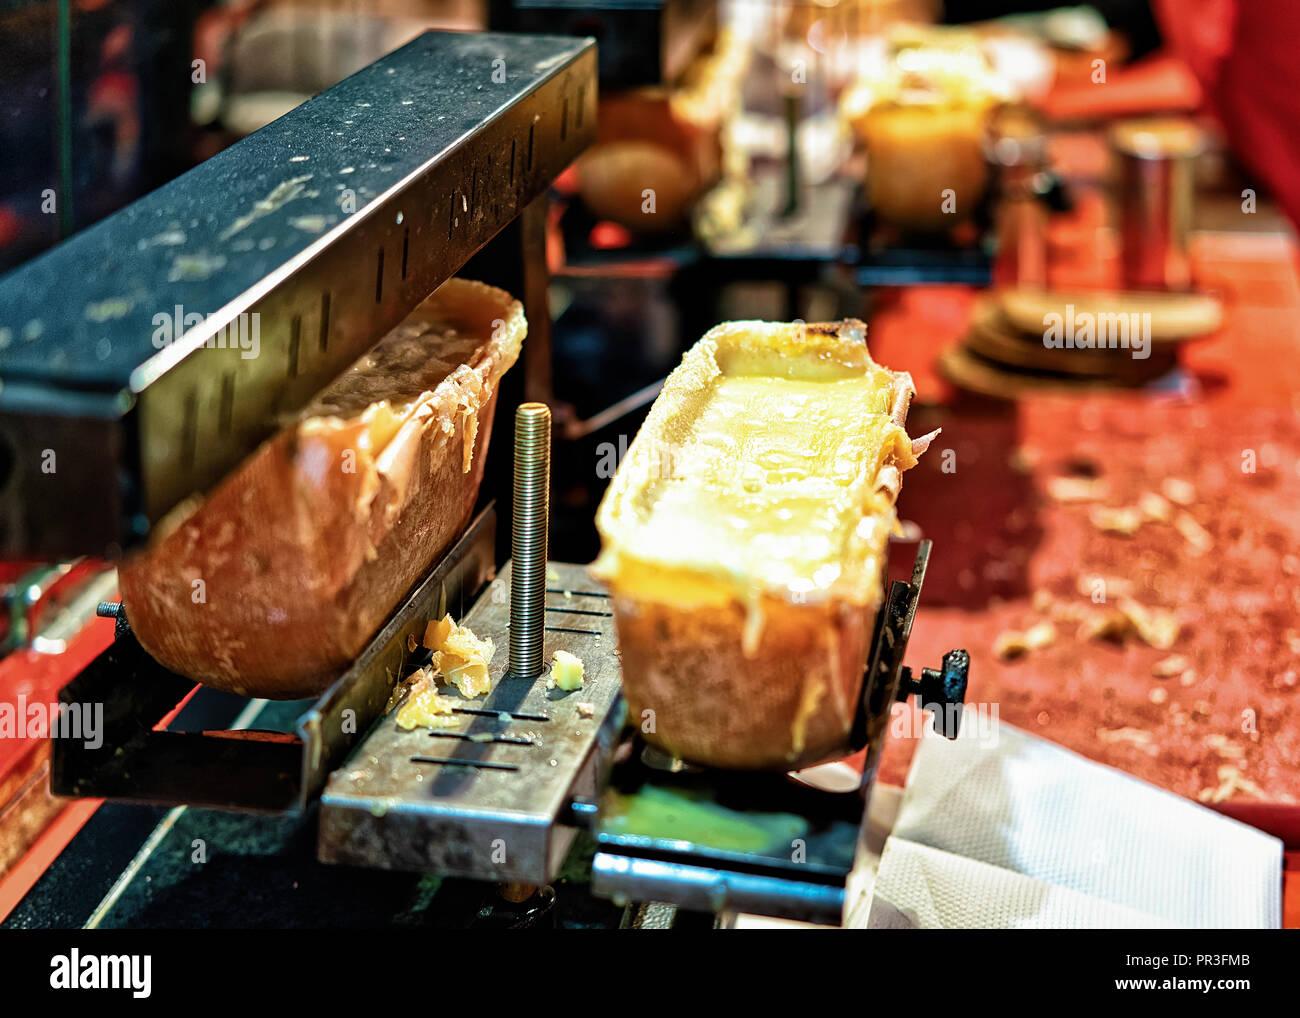 raclette switzerland stockfotos raclette switzerland bilder seite 2 alamy. Black Bedroom Furniture Sets. Home Design Ideas